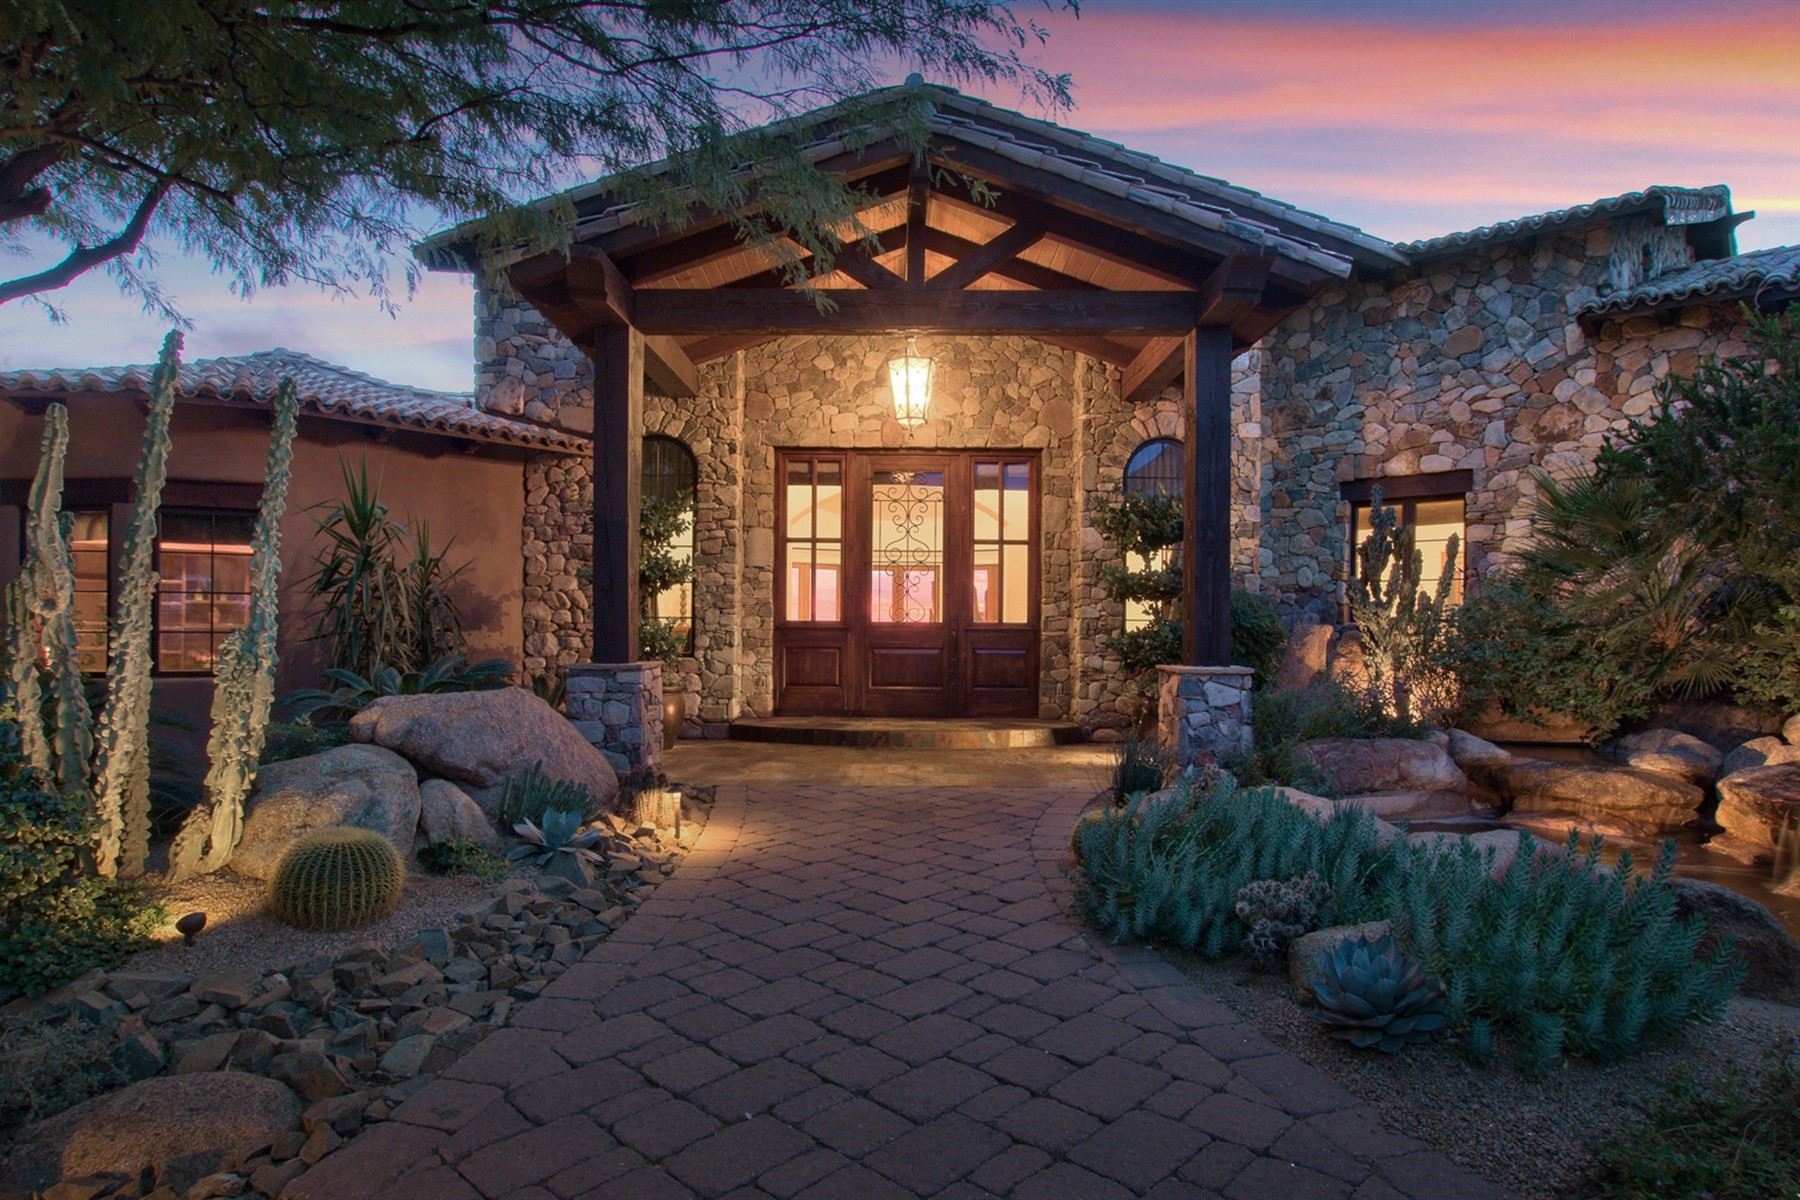 Moradia para Venda às Italian Villa in the heart of Saguaro Forest Village 41737 N 101st Pl, Scottsdale, Arizona, 85262 Estados Unidos